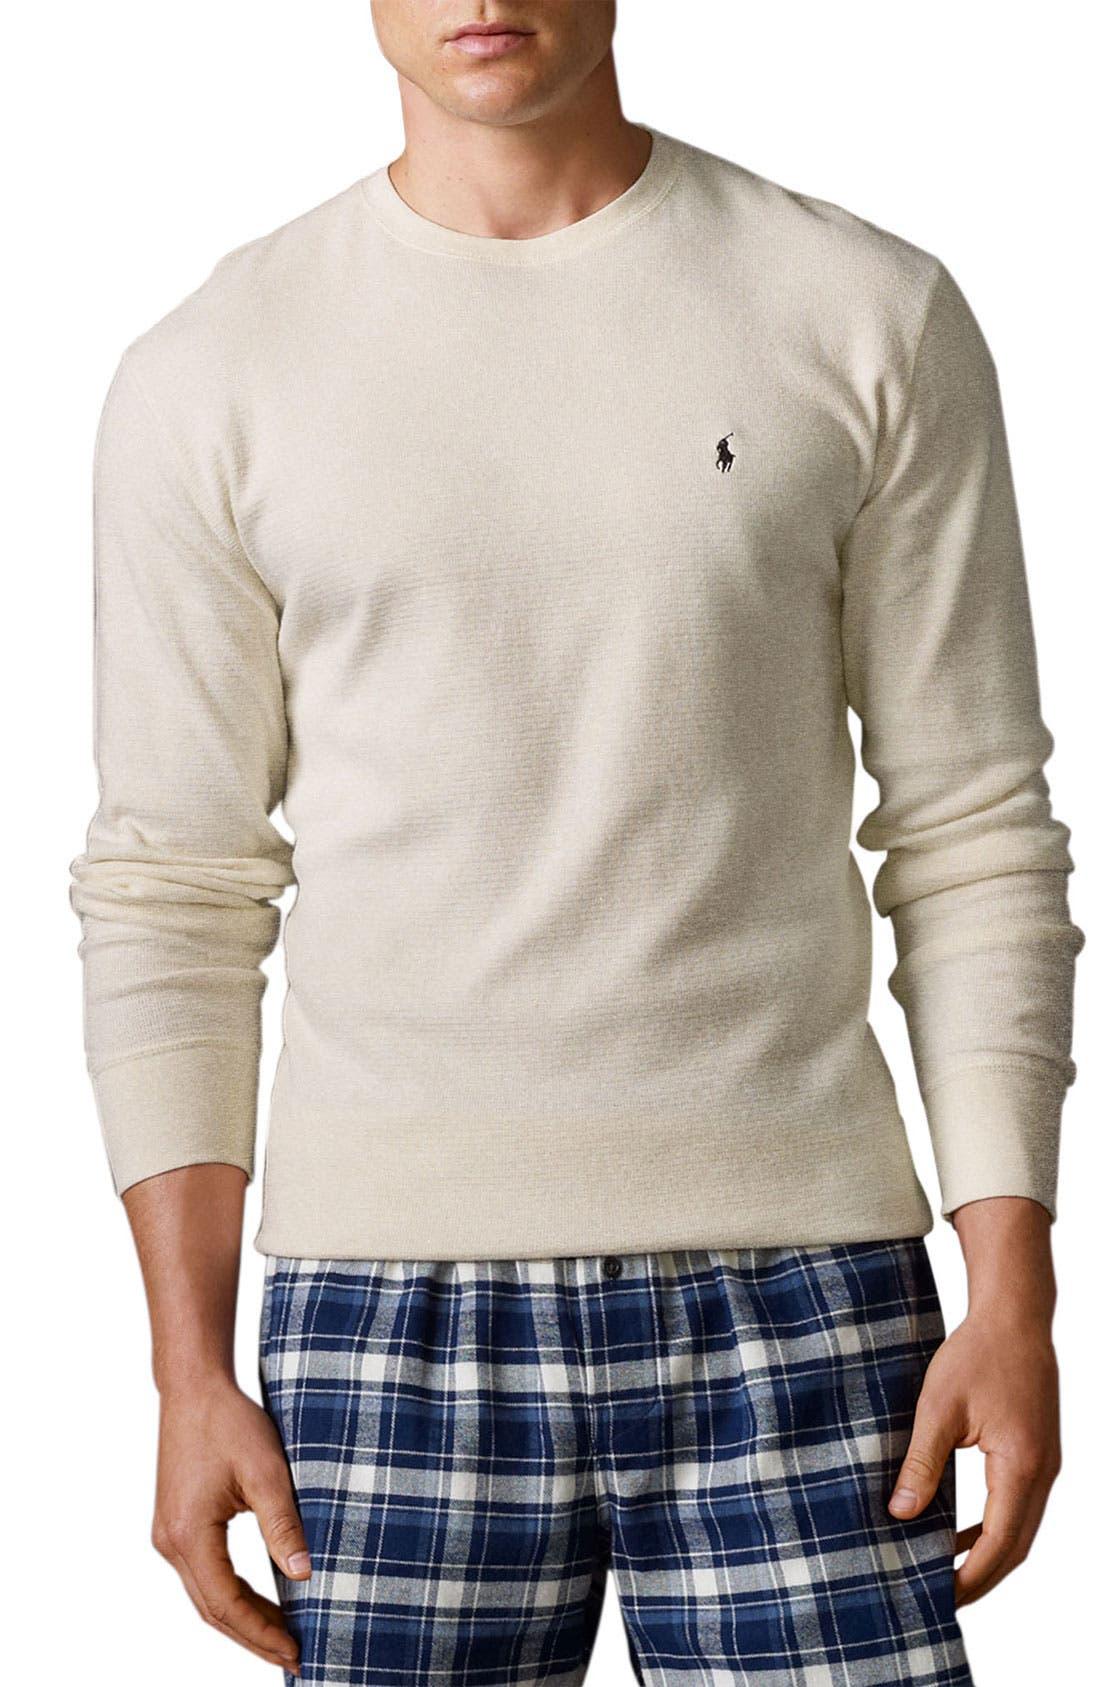 Alternate Image 1 Selected - Polo Ralph Lauren Thermal Crewneck Lounge Shirt